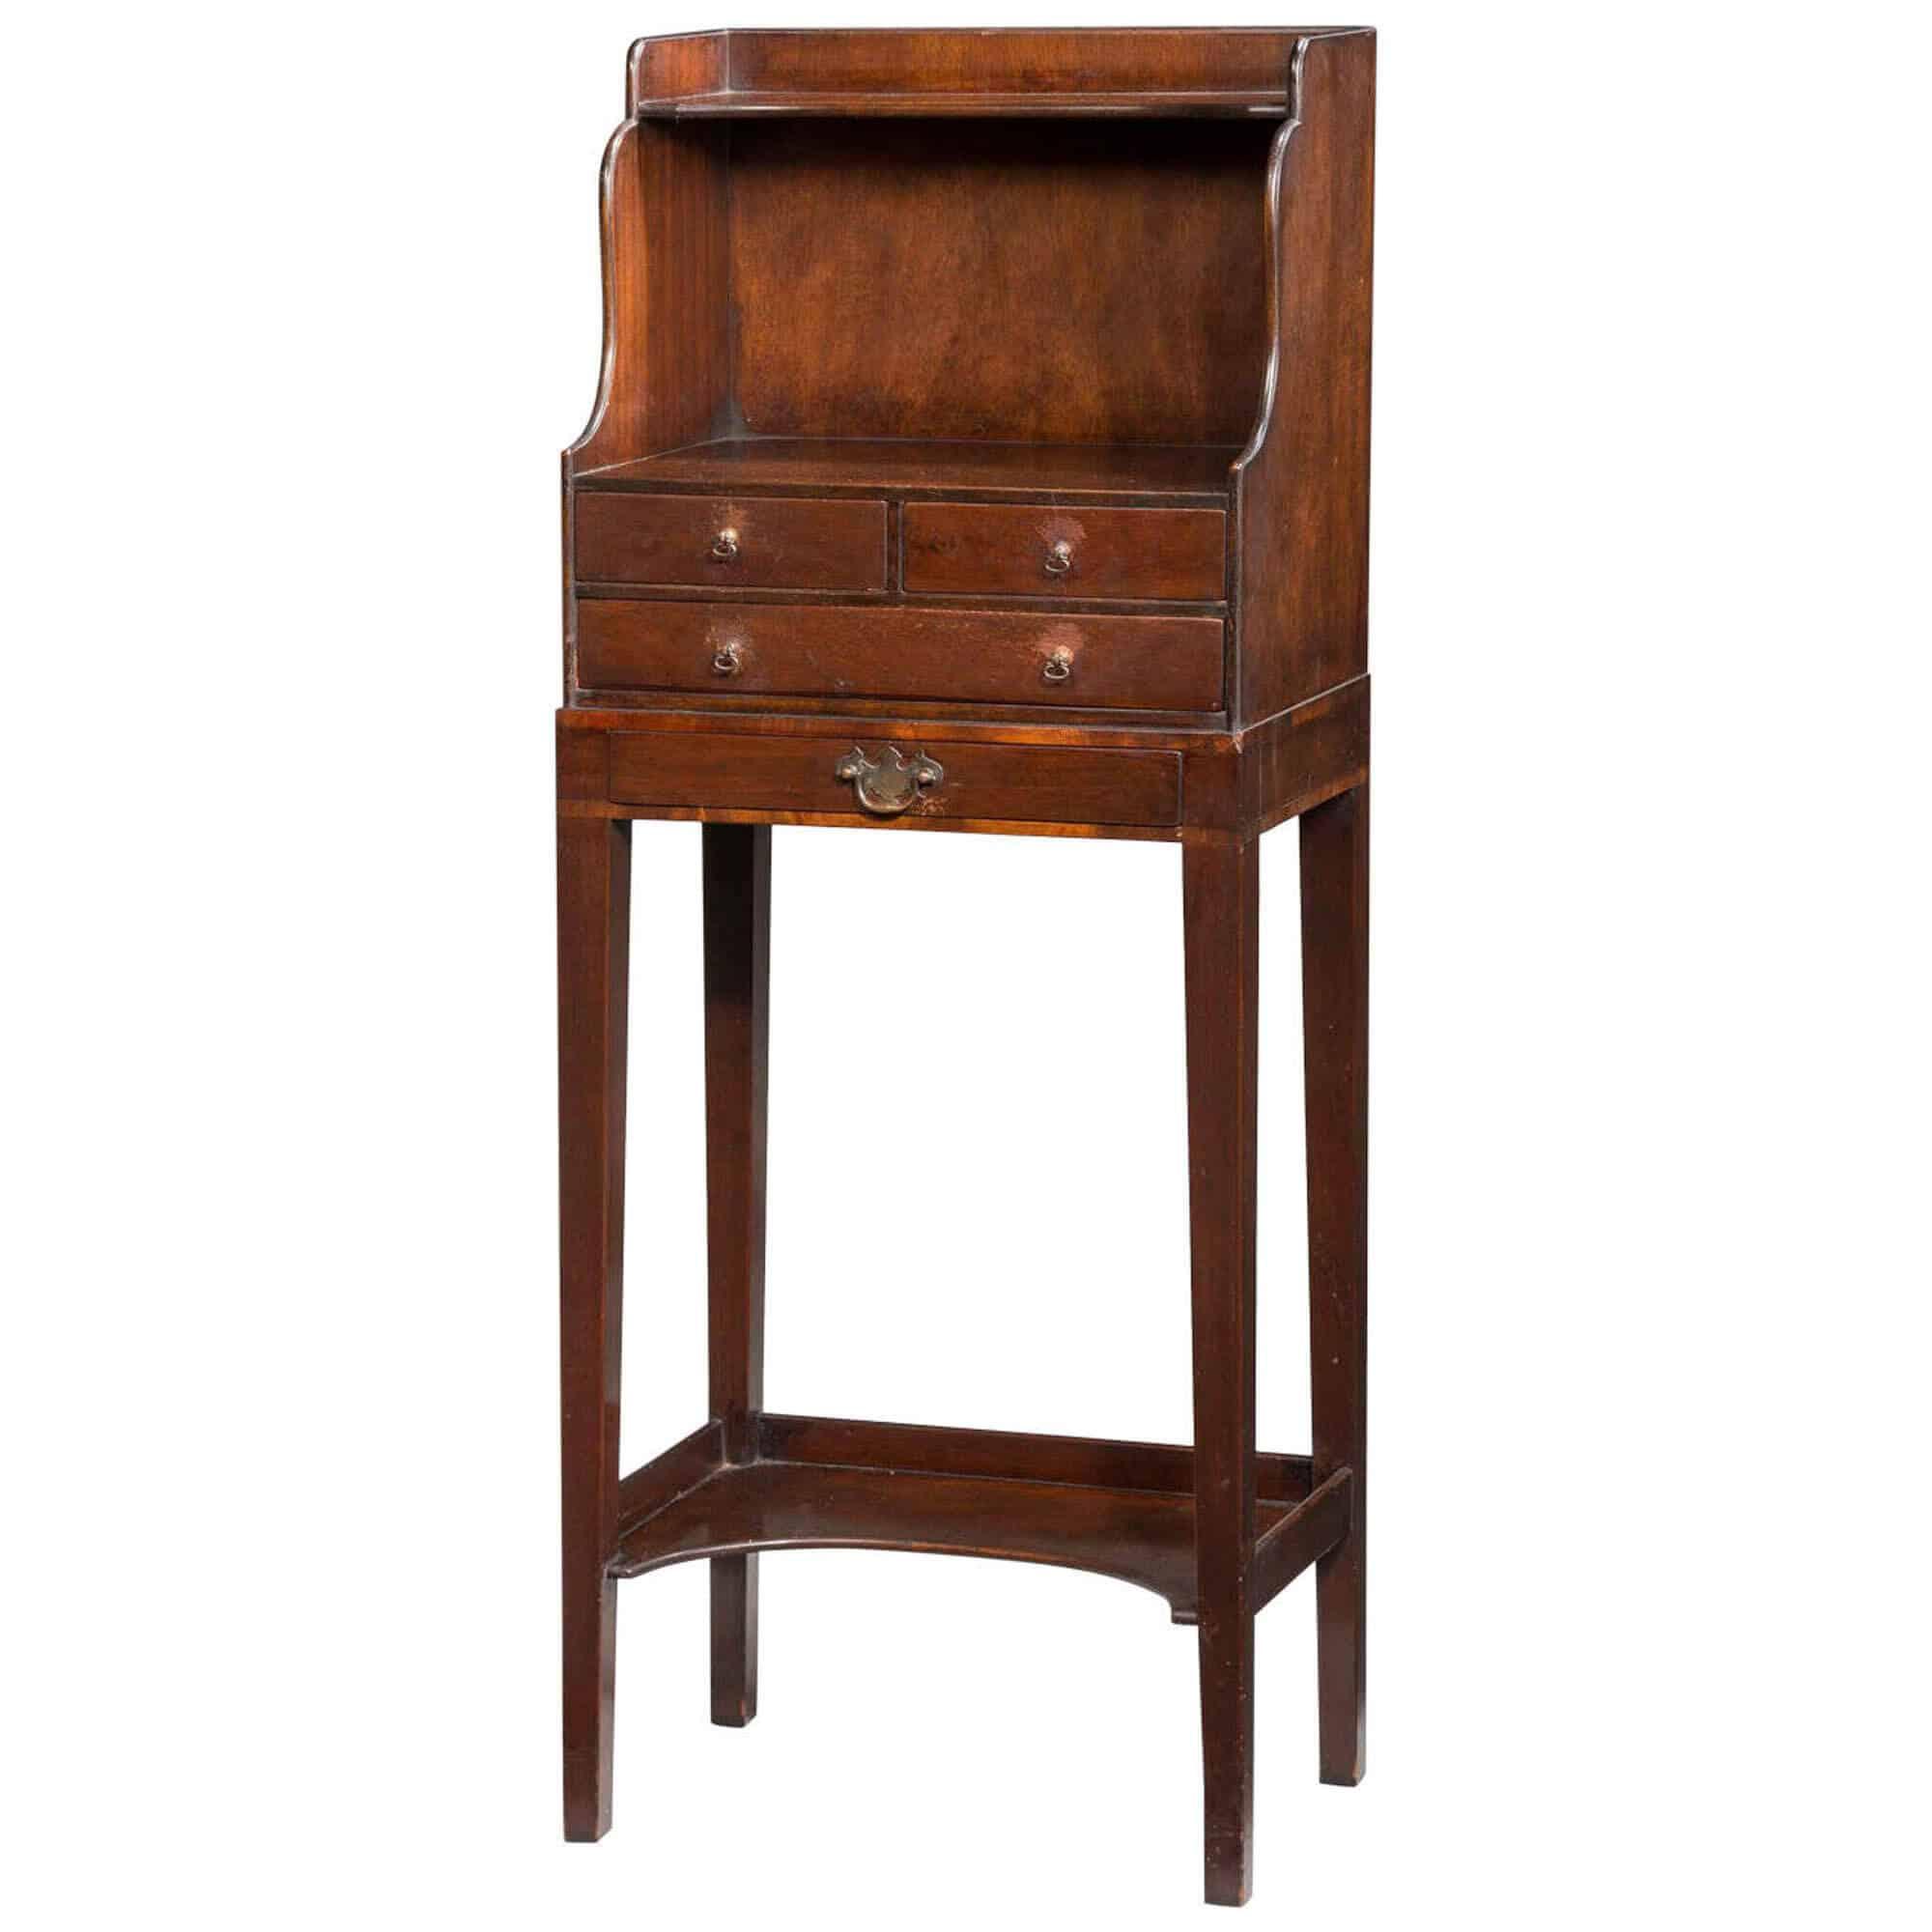 Good Classic Cheveret Desk